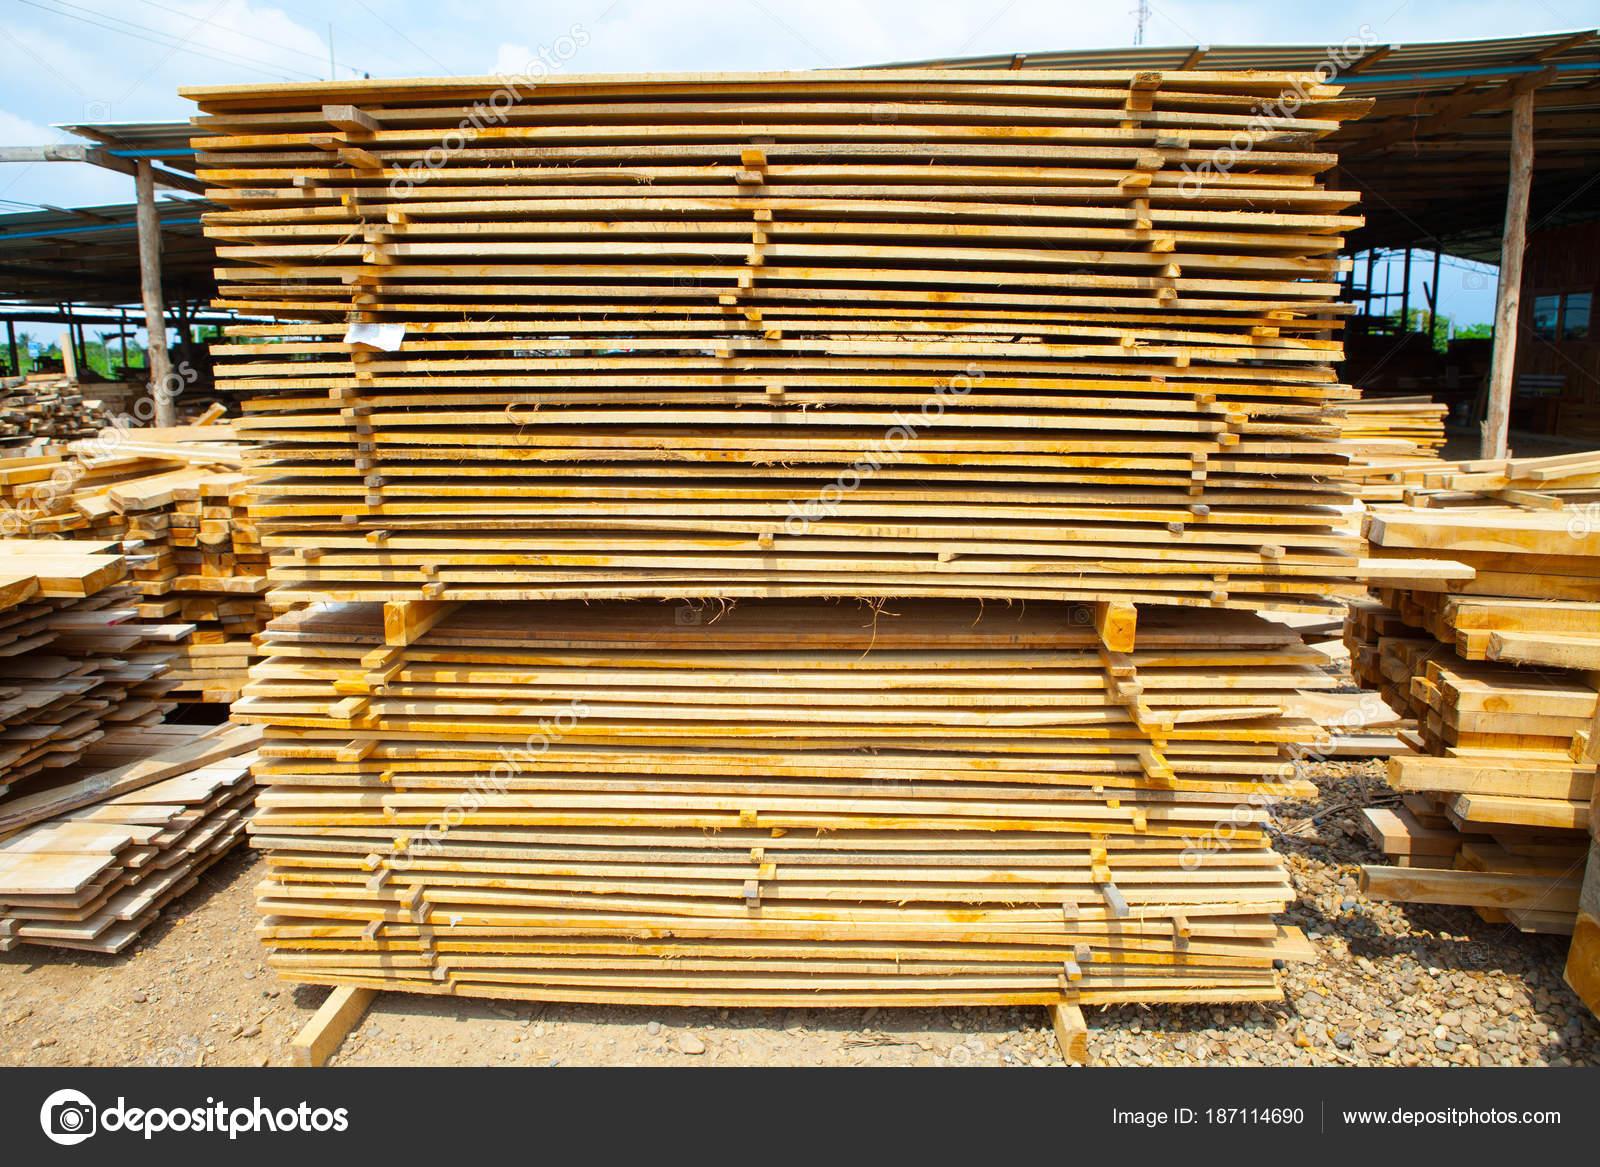 Stapel Von Teak Holz Bretter Im Holzlager Haufen Aus Holz